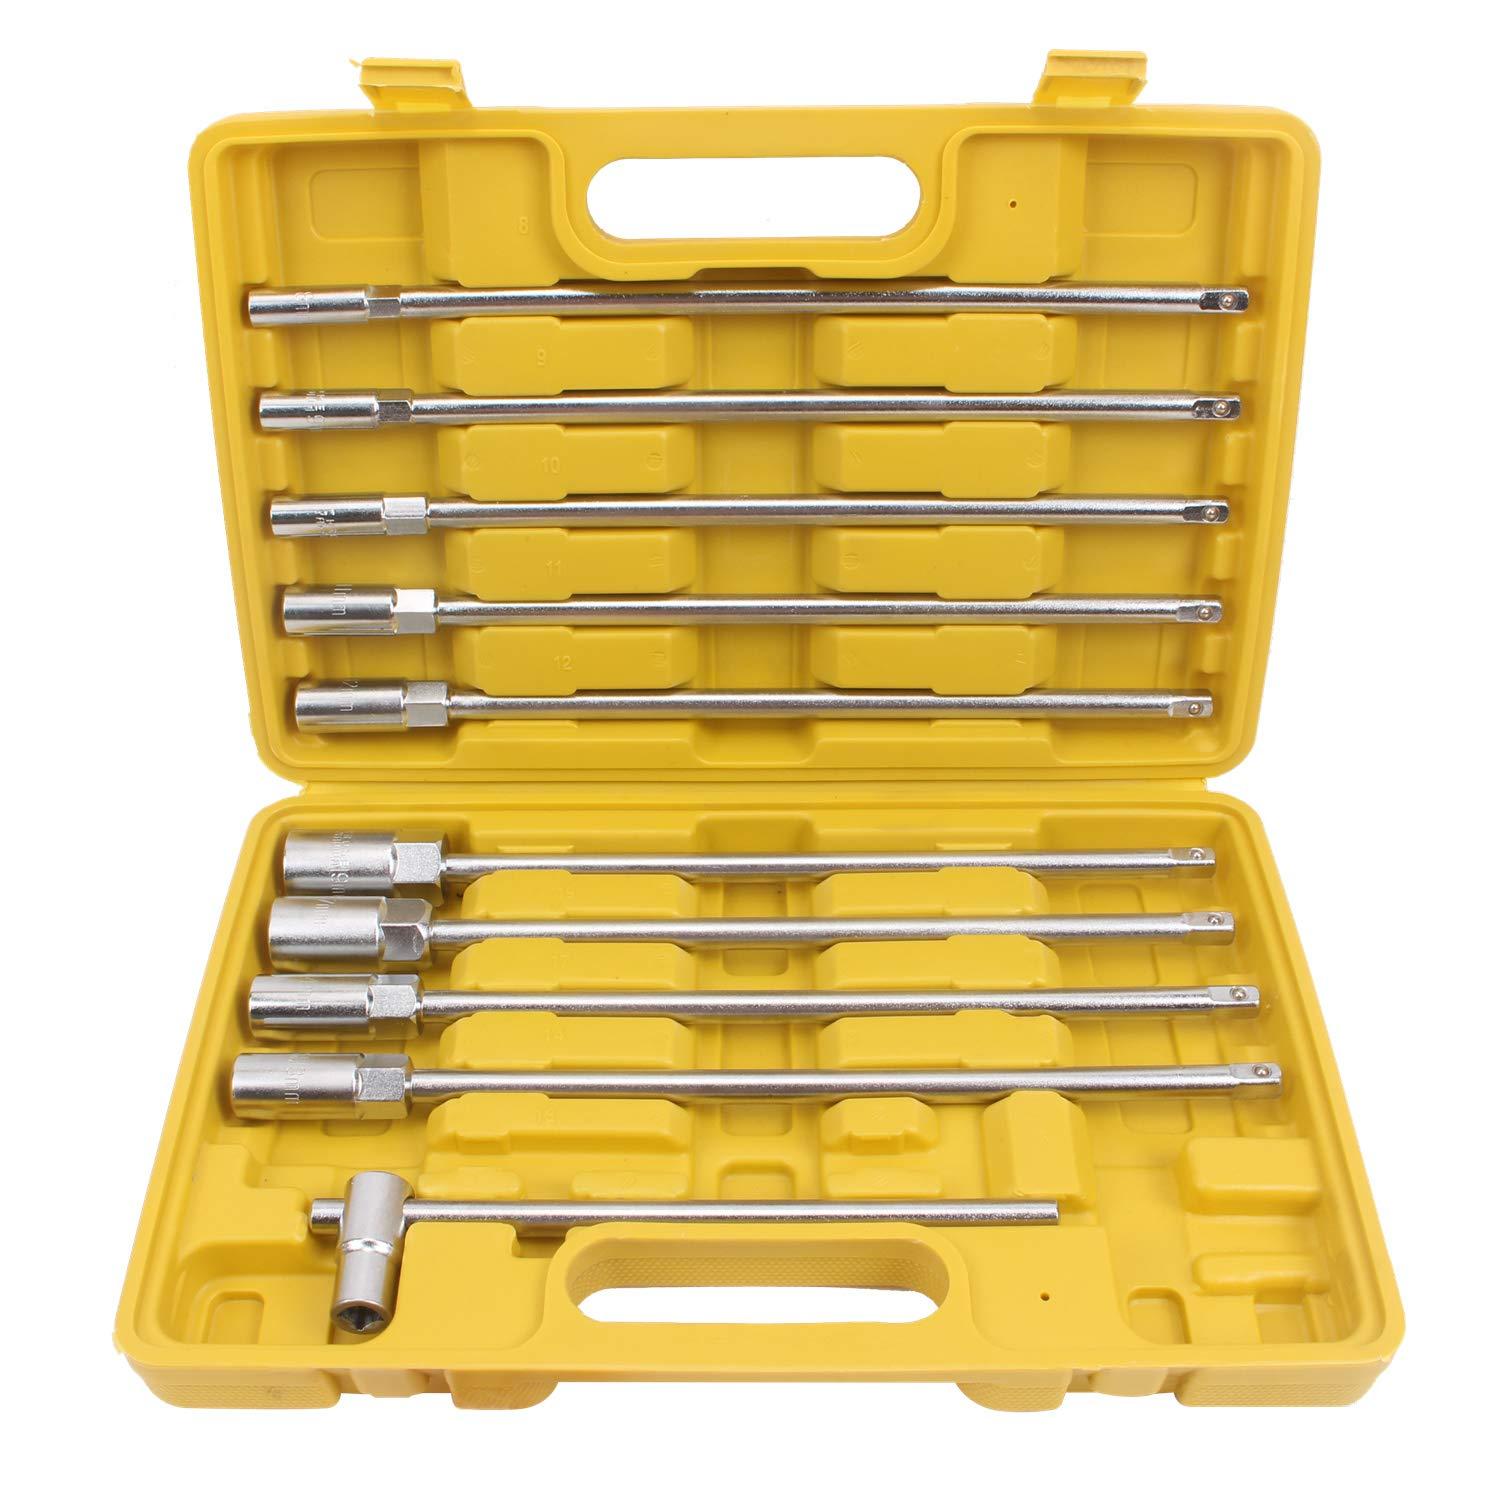 T-Griff Innen-6-Kant sechskant Innensechskant Schraubendreher Stiftschlüssel 8St